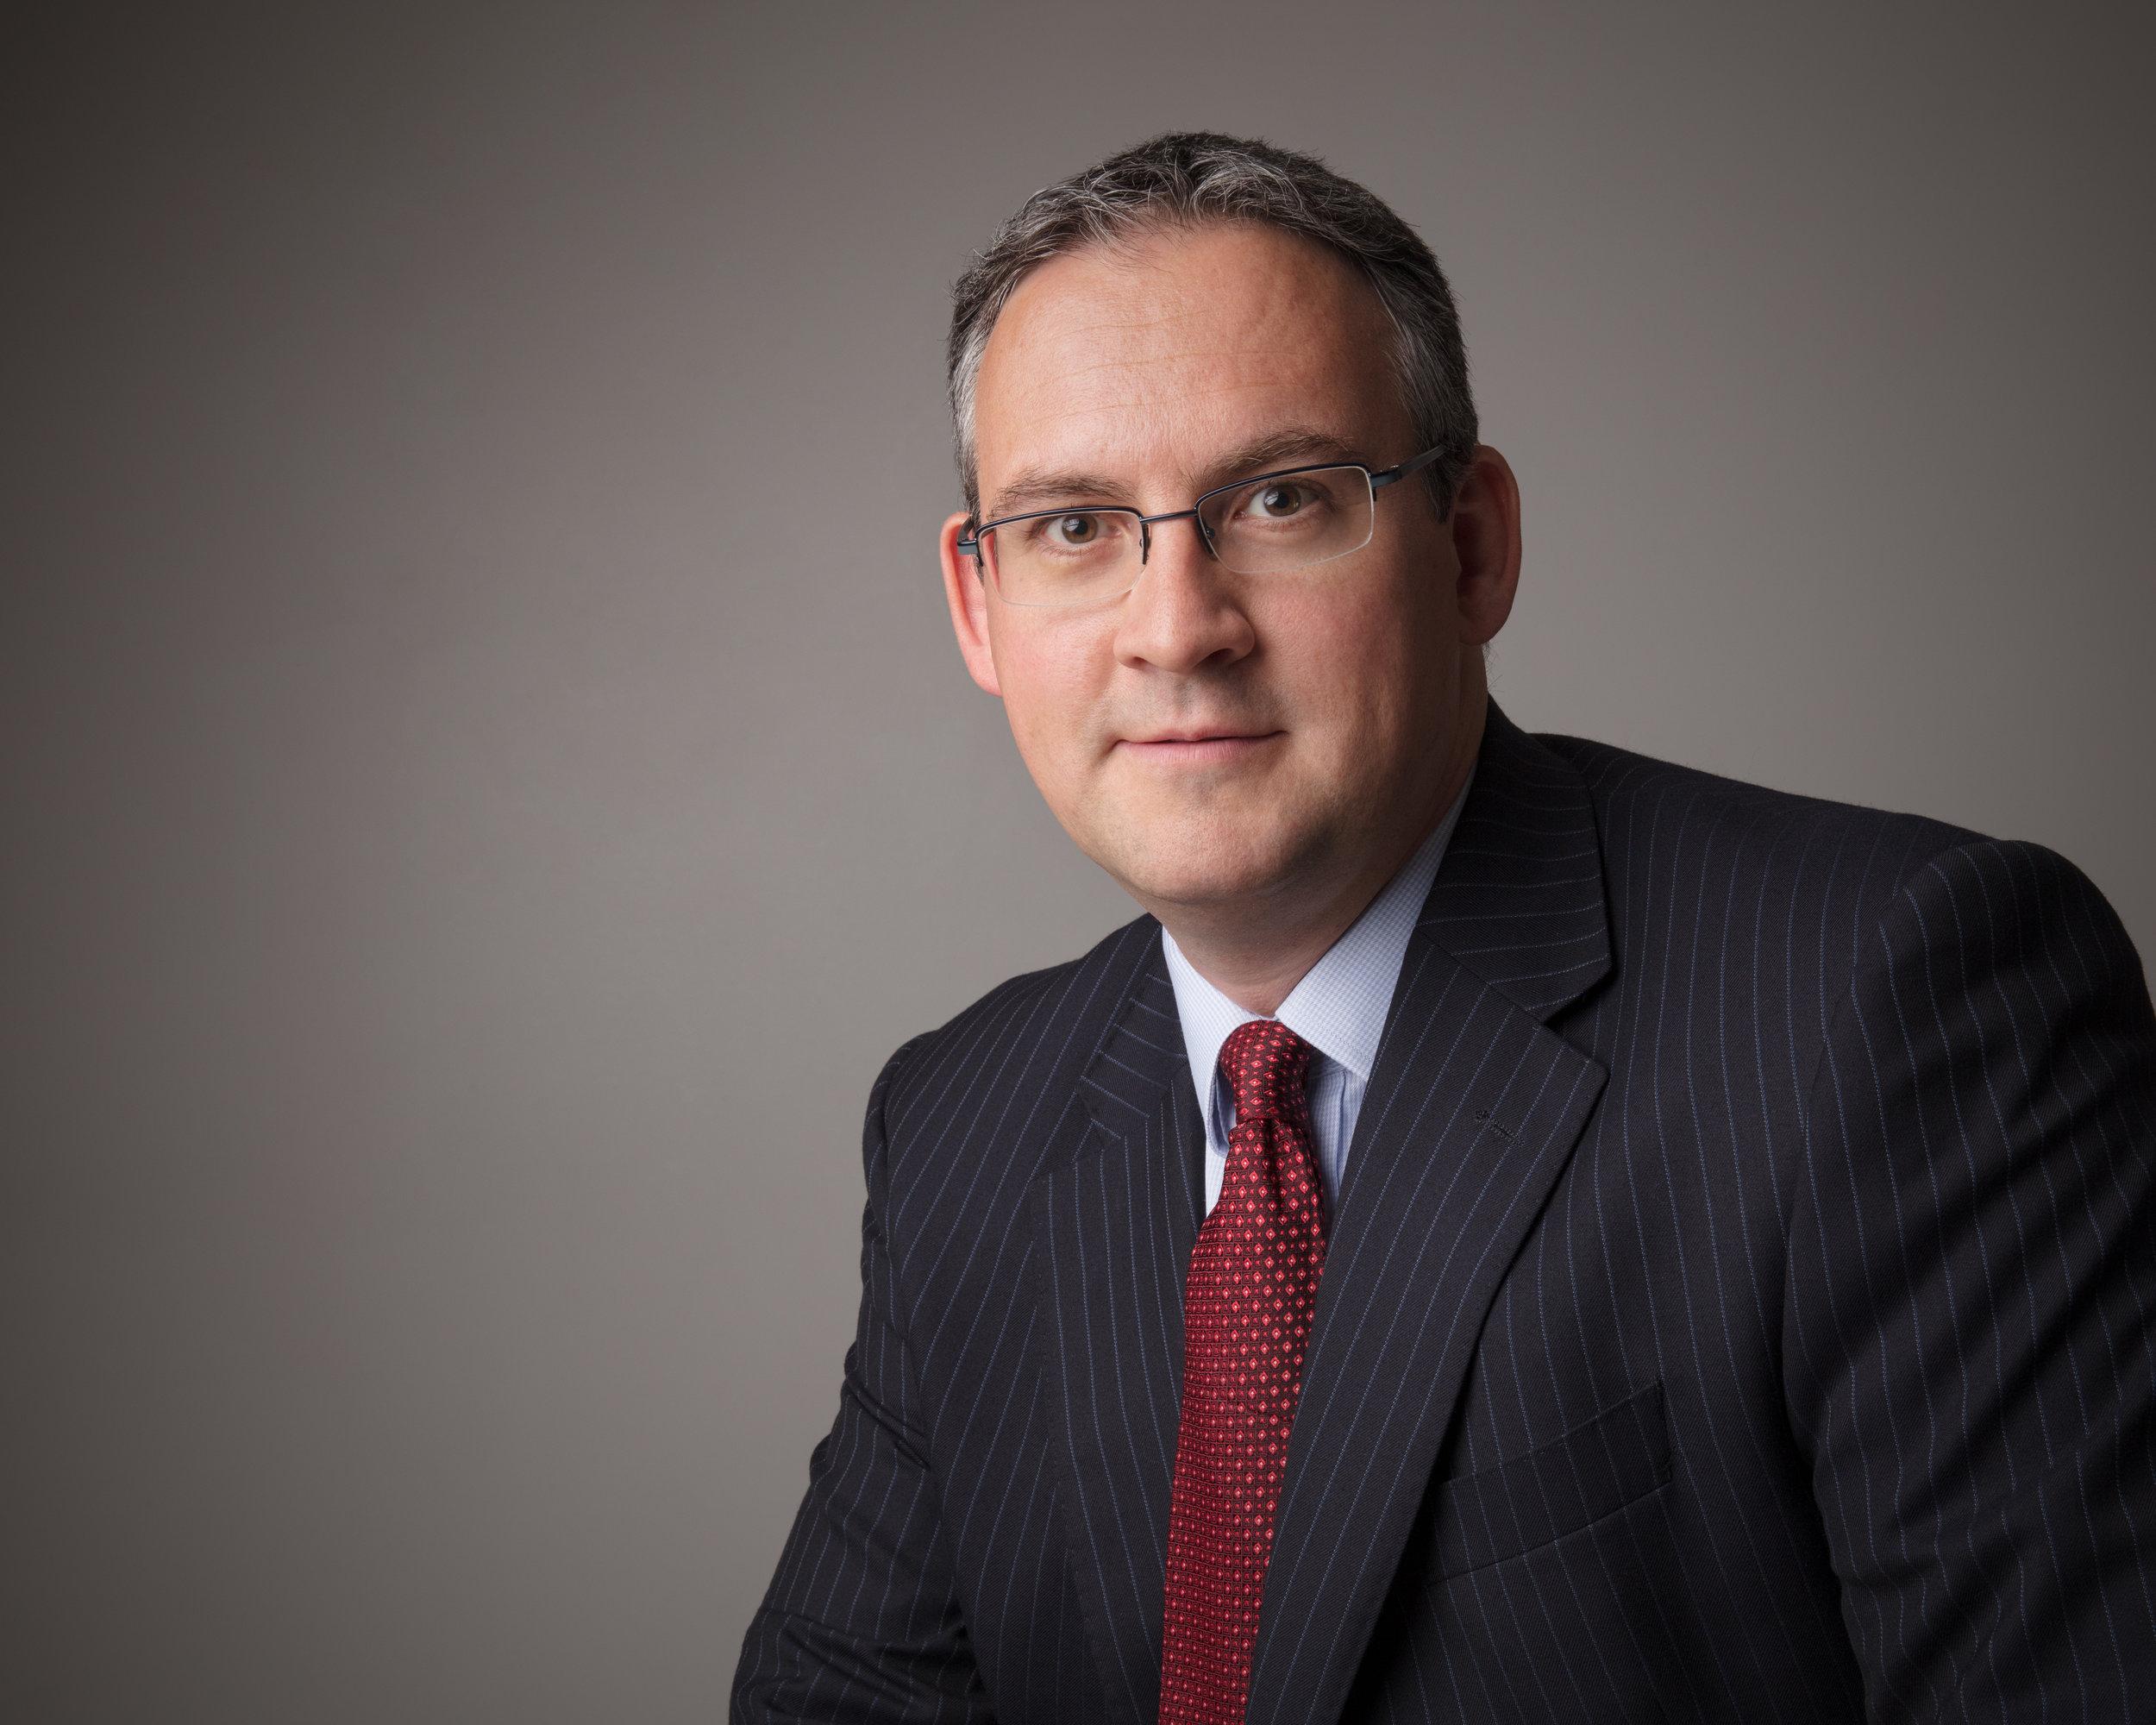 Mr Stephen Morris